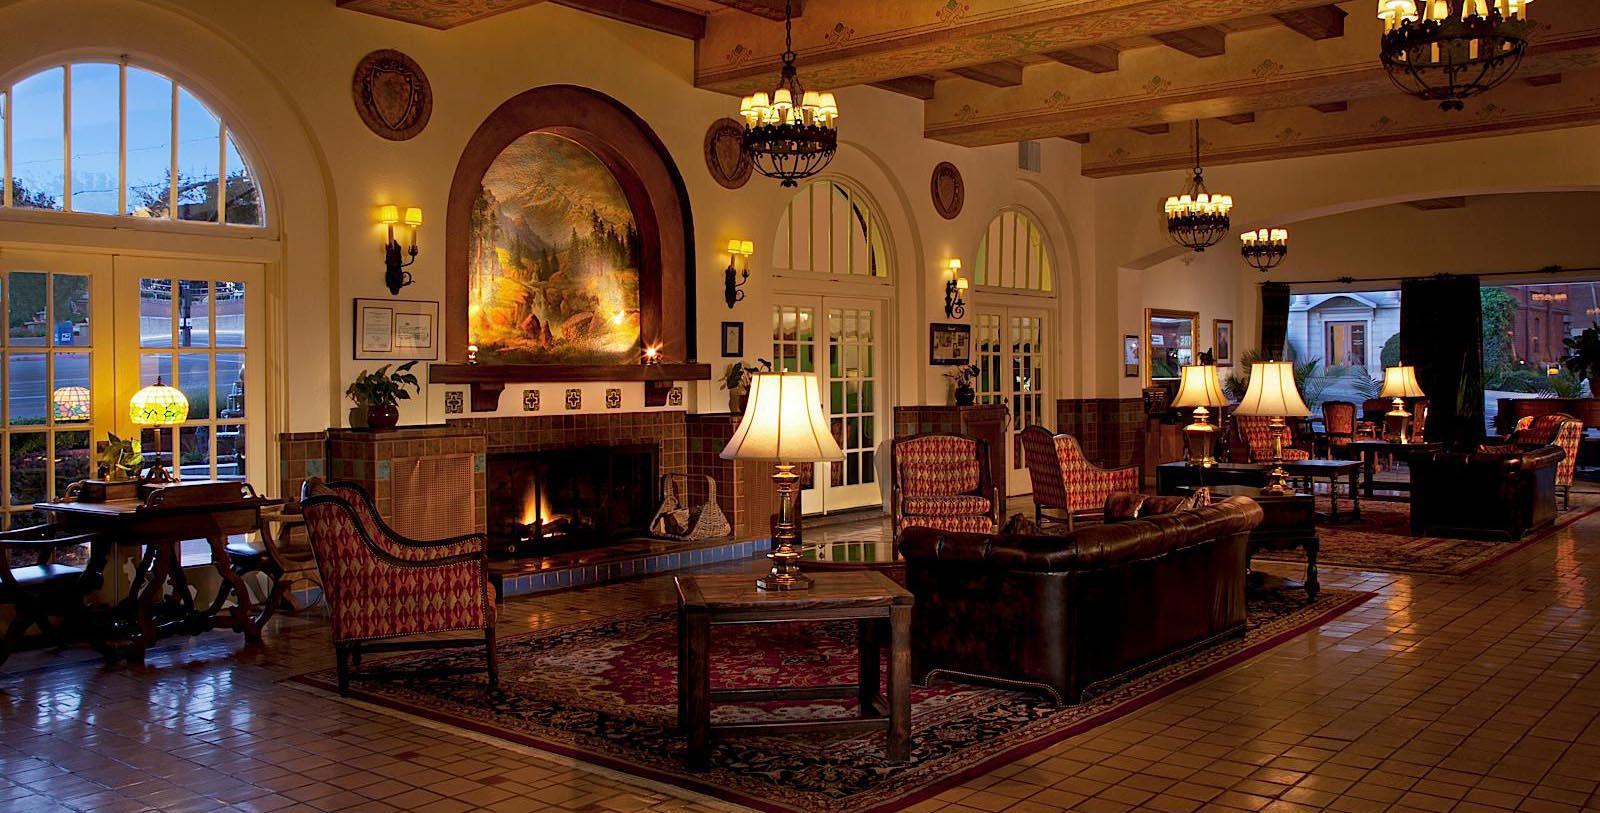 Image of lobby lounge area Hassayampa Inn, 1927, Member of Historic Hotels of America, in Prescott, Arizona, Explore